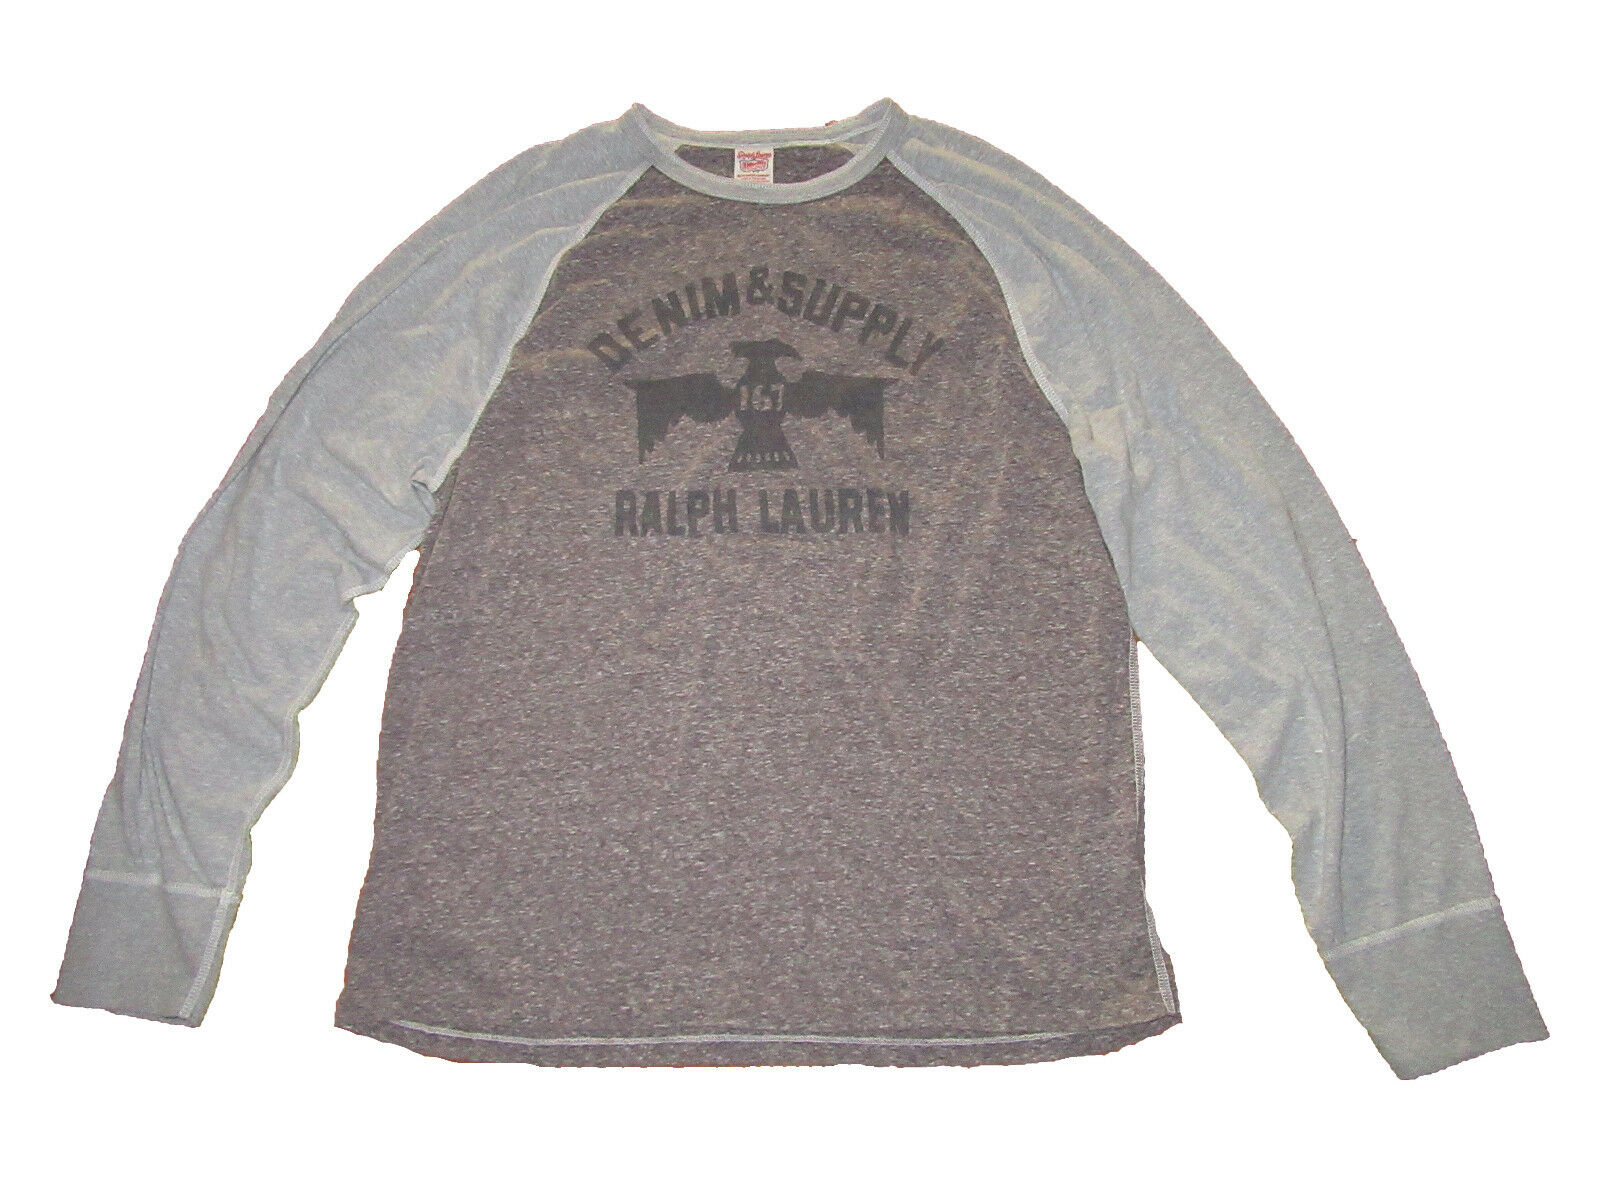 Ralph Lauren Denim and Supply Southwest Eagle Polo Soft Jersey T Shirt XL